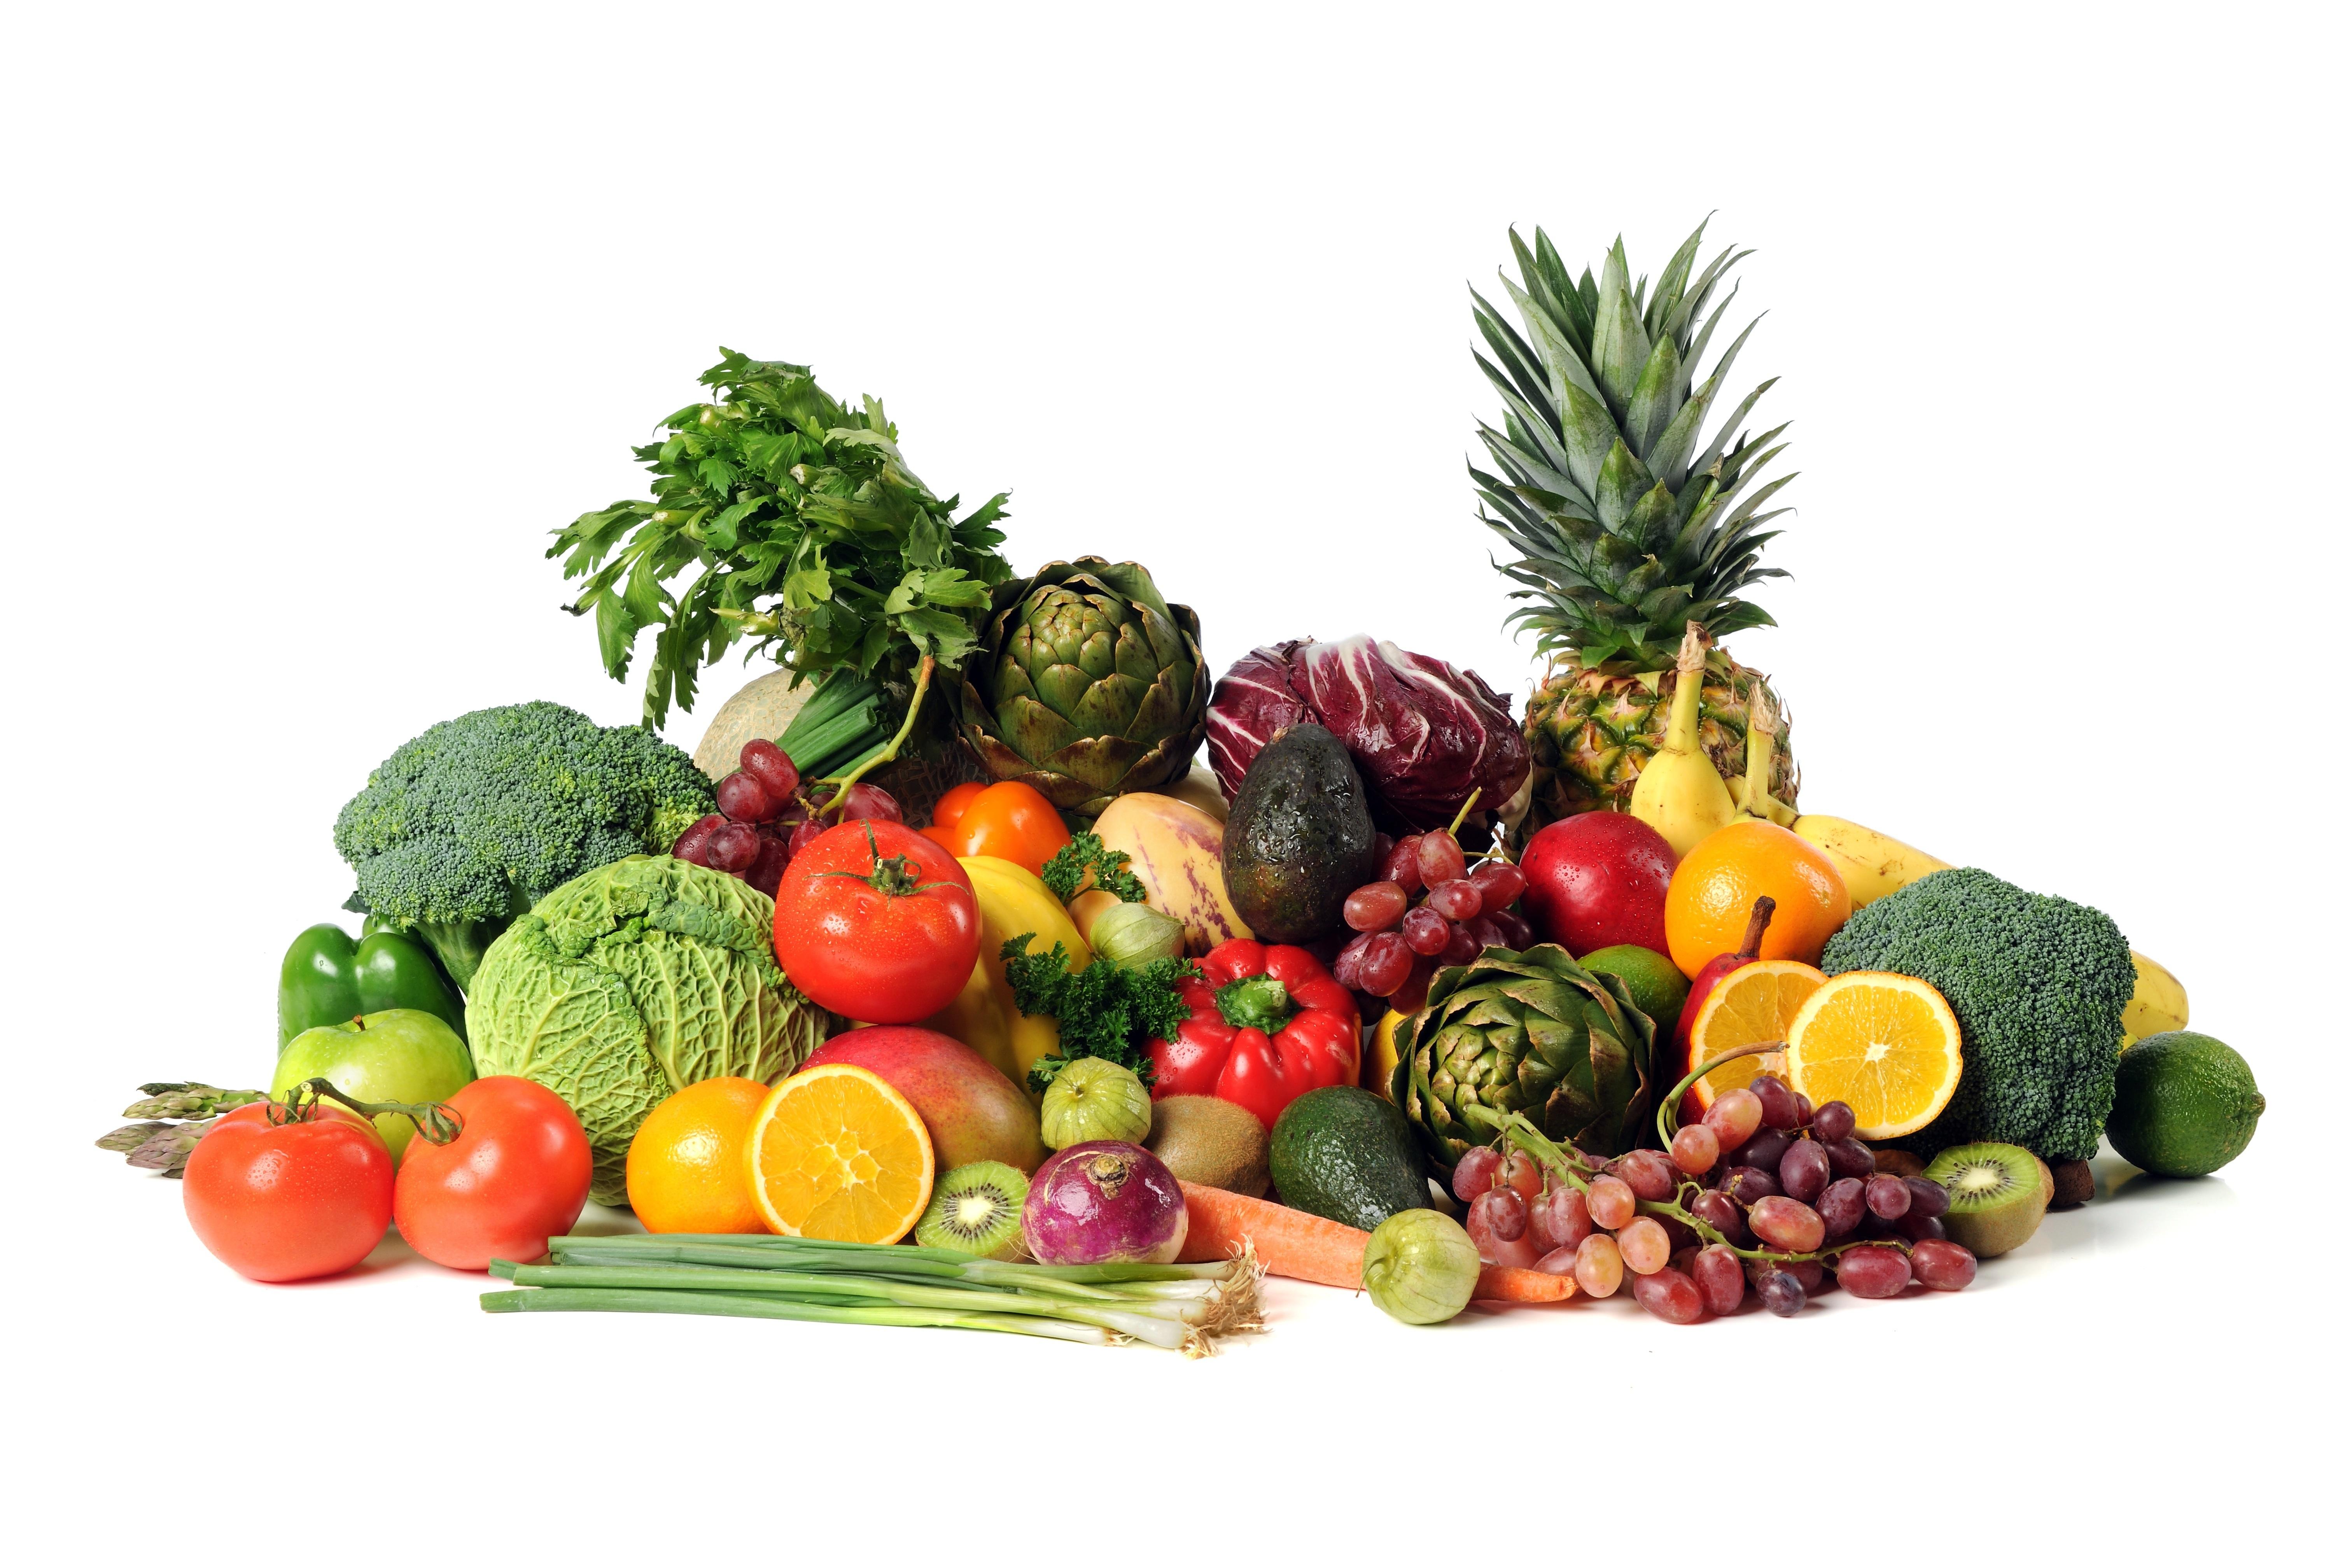 lynd fruit farm good healthy fruit smoothies